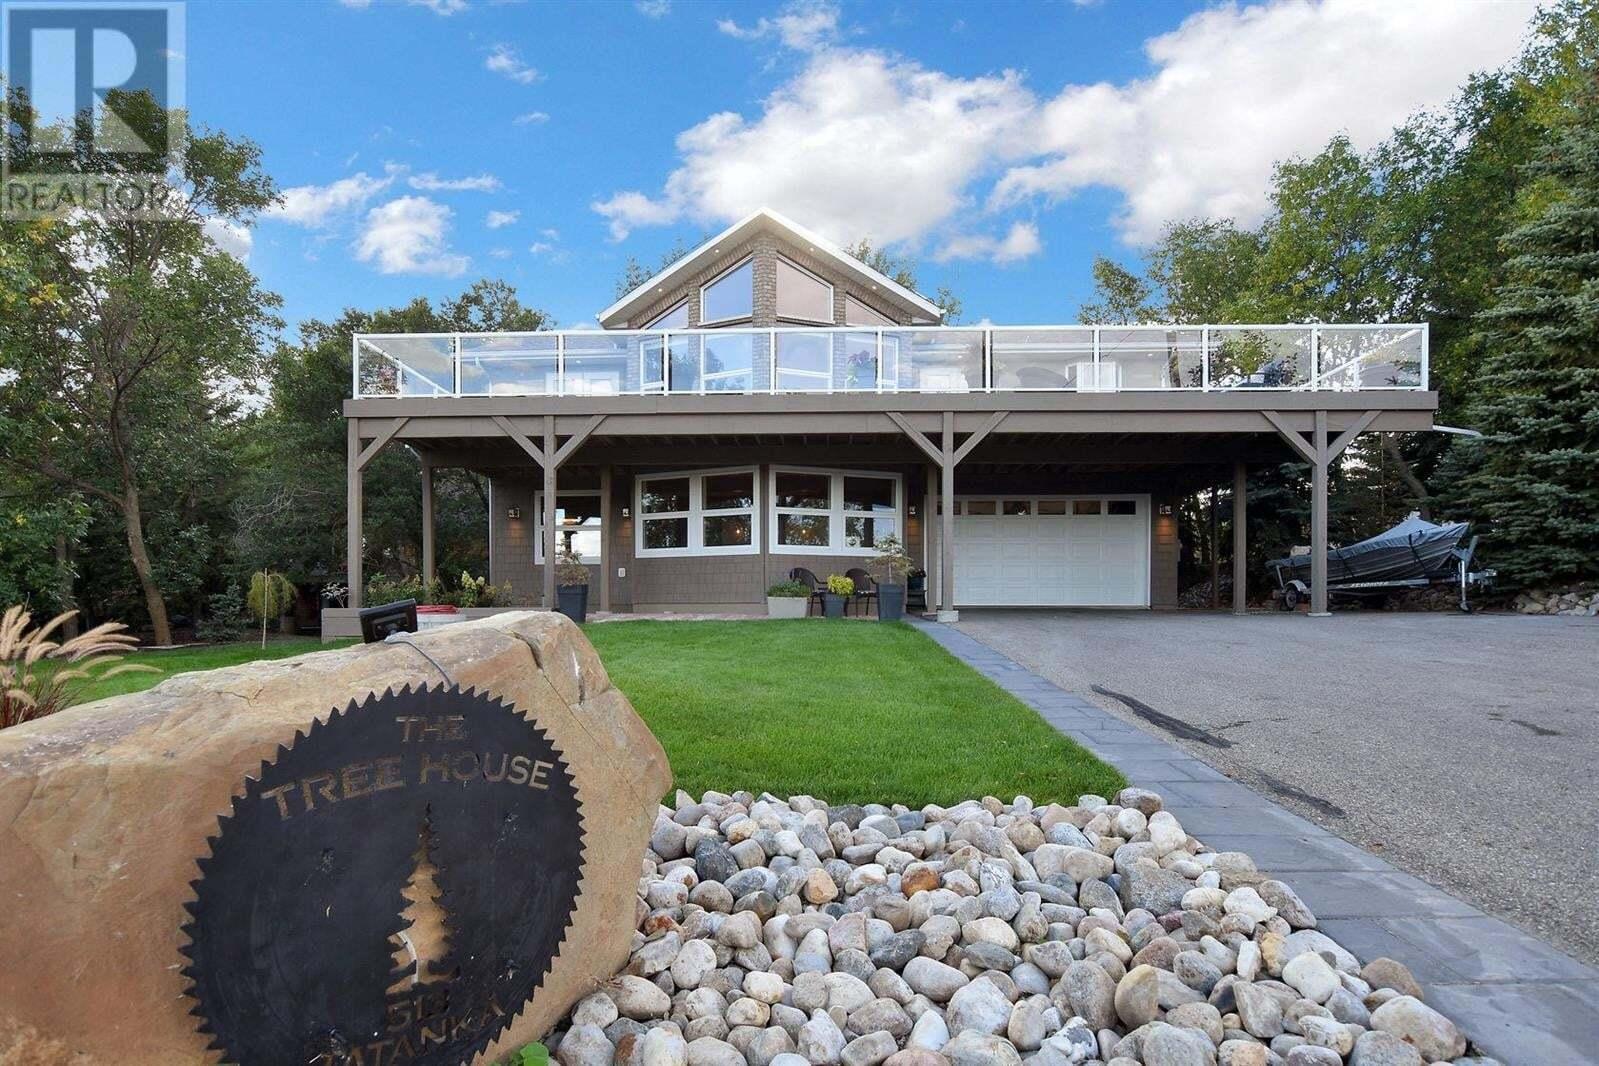 House for sale at 513 Tatanka Dr Buffalo Pound Lake Saskatchewan - MLS: SK825739